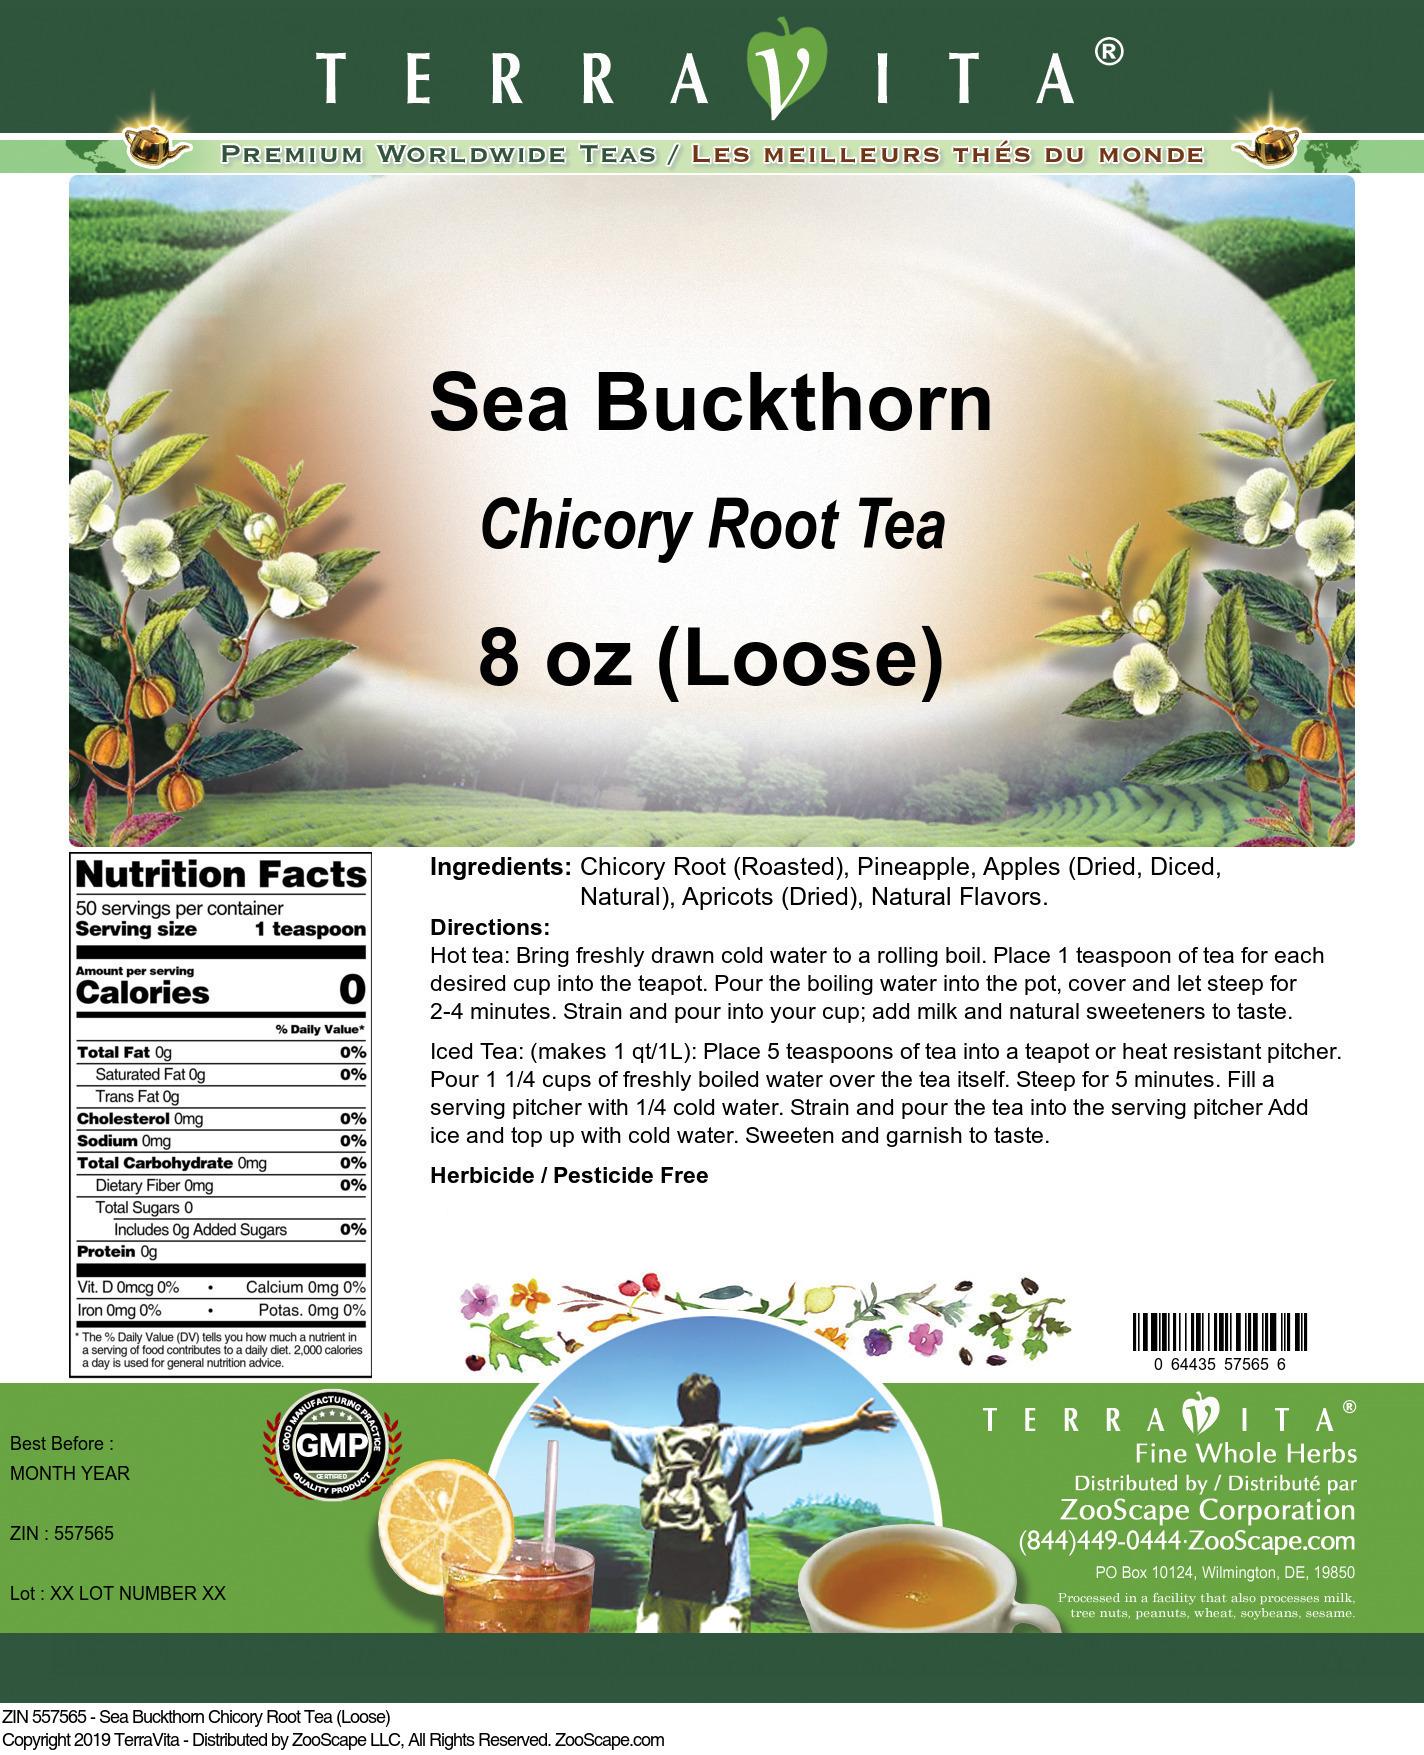 Sea Buckthorn Chicory Root Tea (Loose)